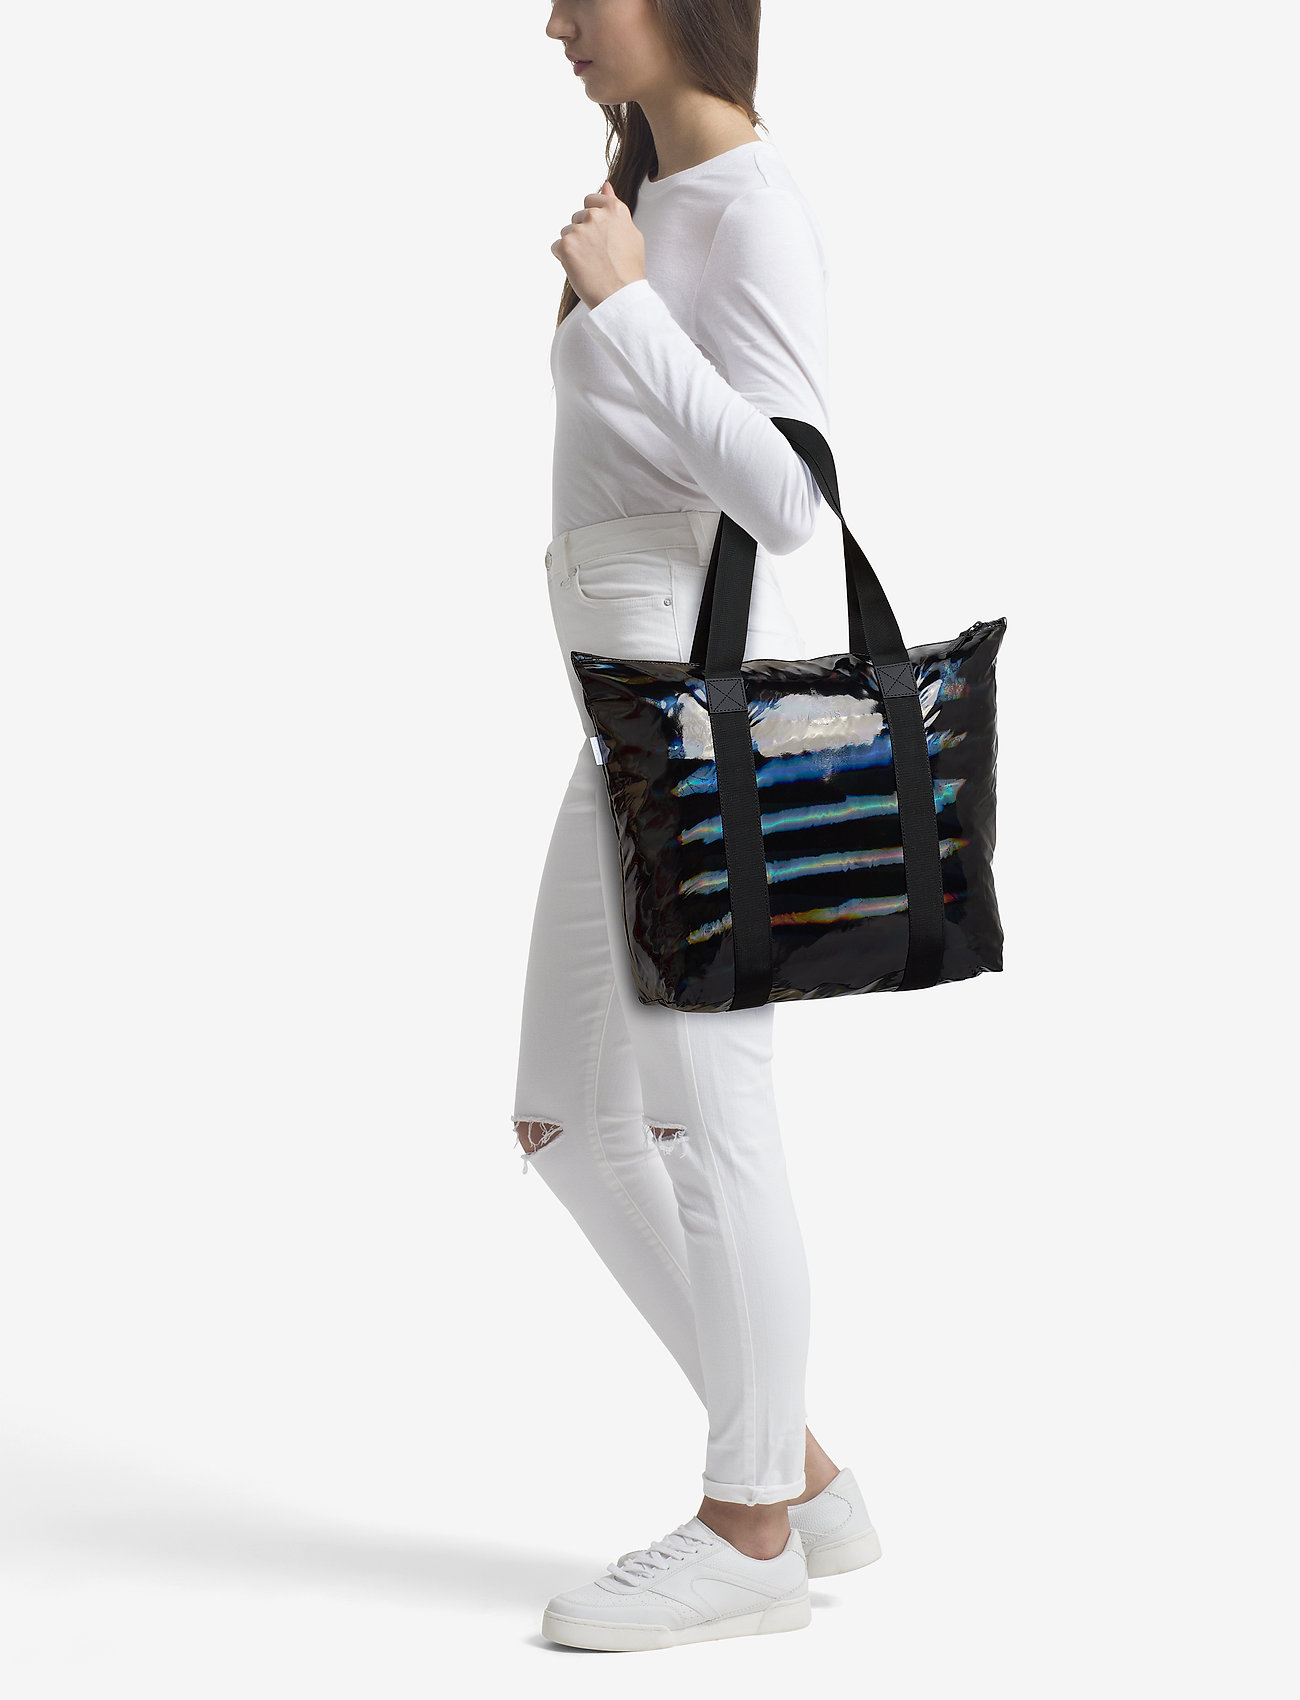 d81256f3c Holographic Tote Bag Rush (25 Holographic Black) (55 €) - Rains ...